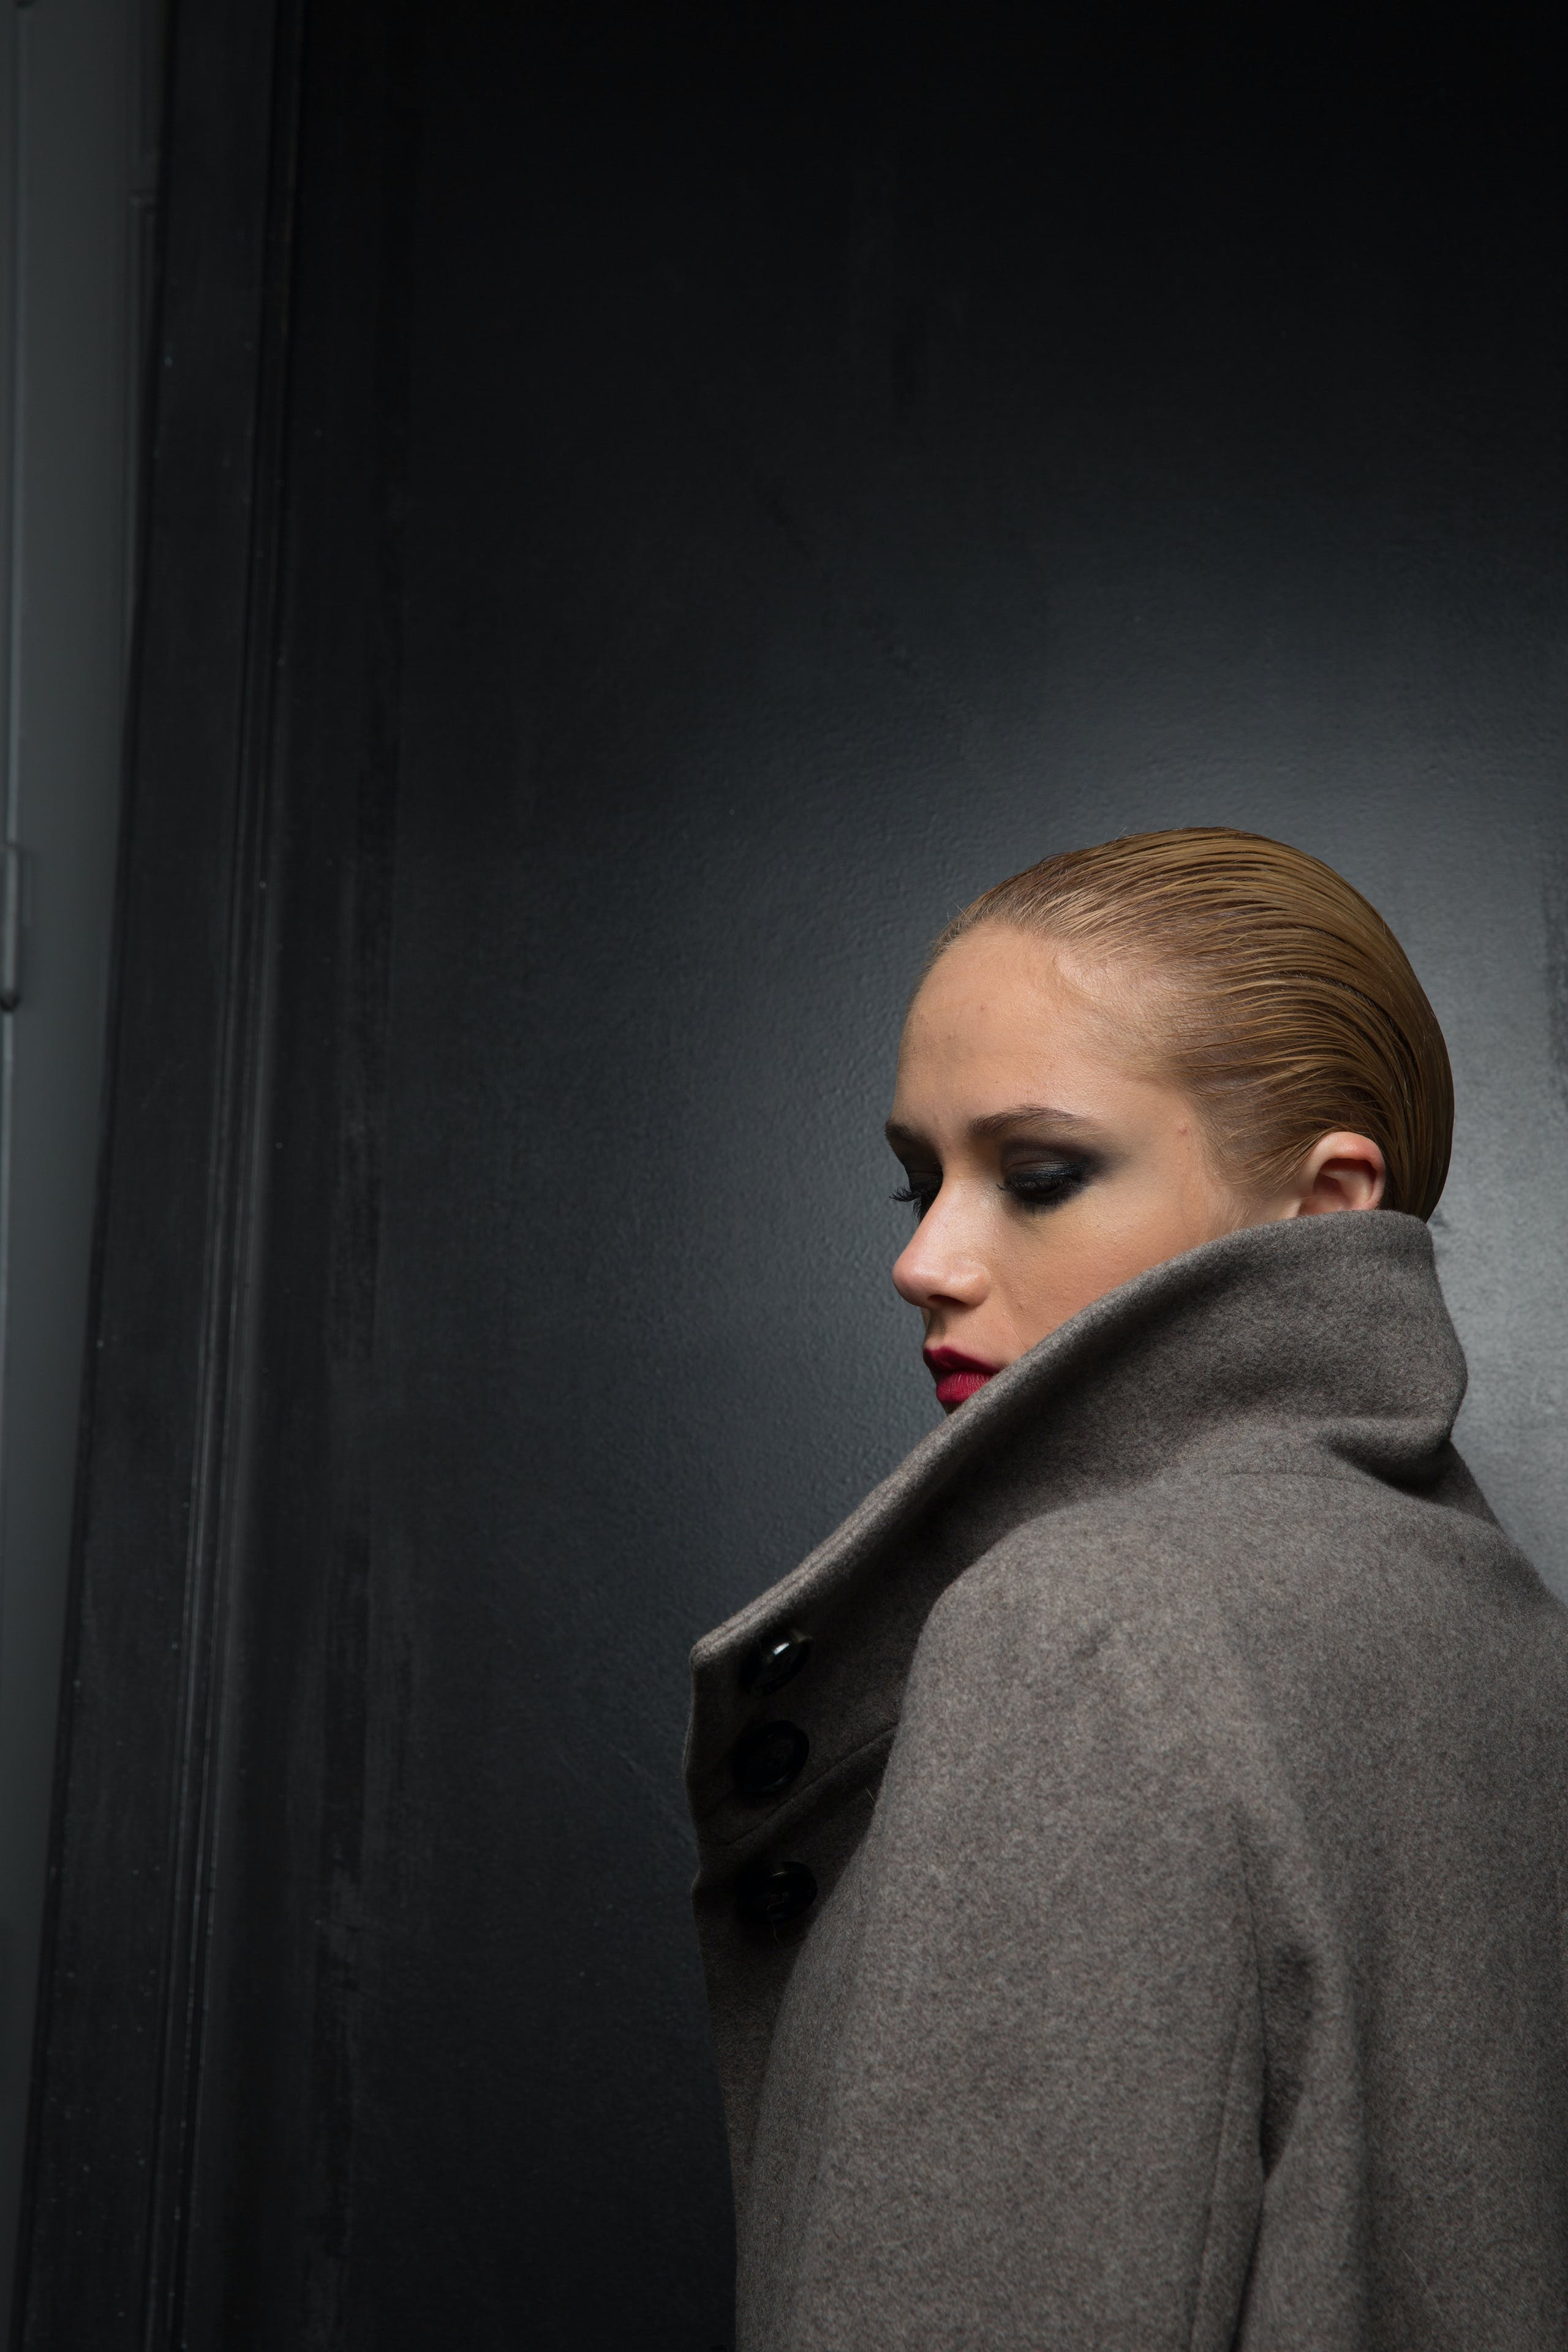 Woman in Gray Coat